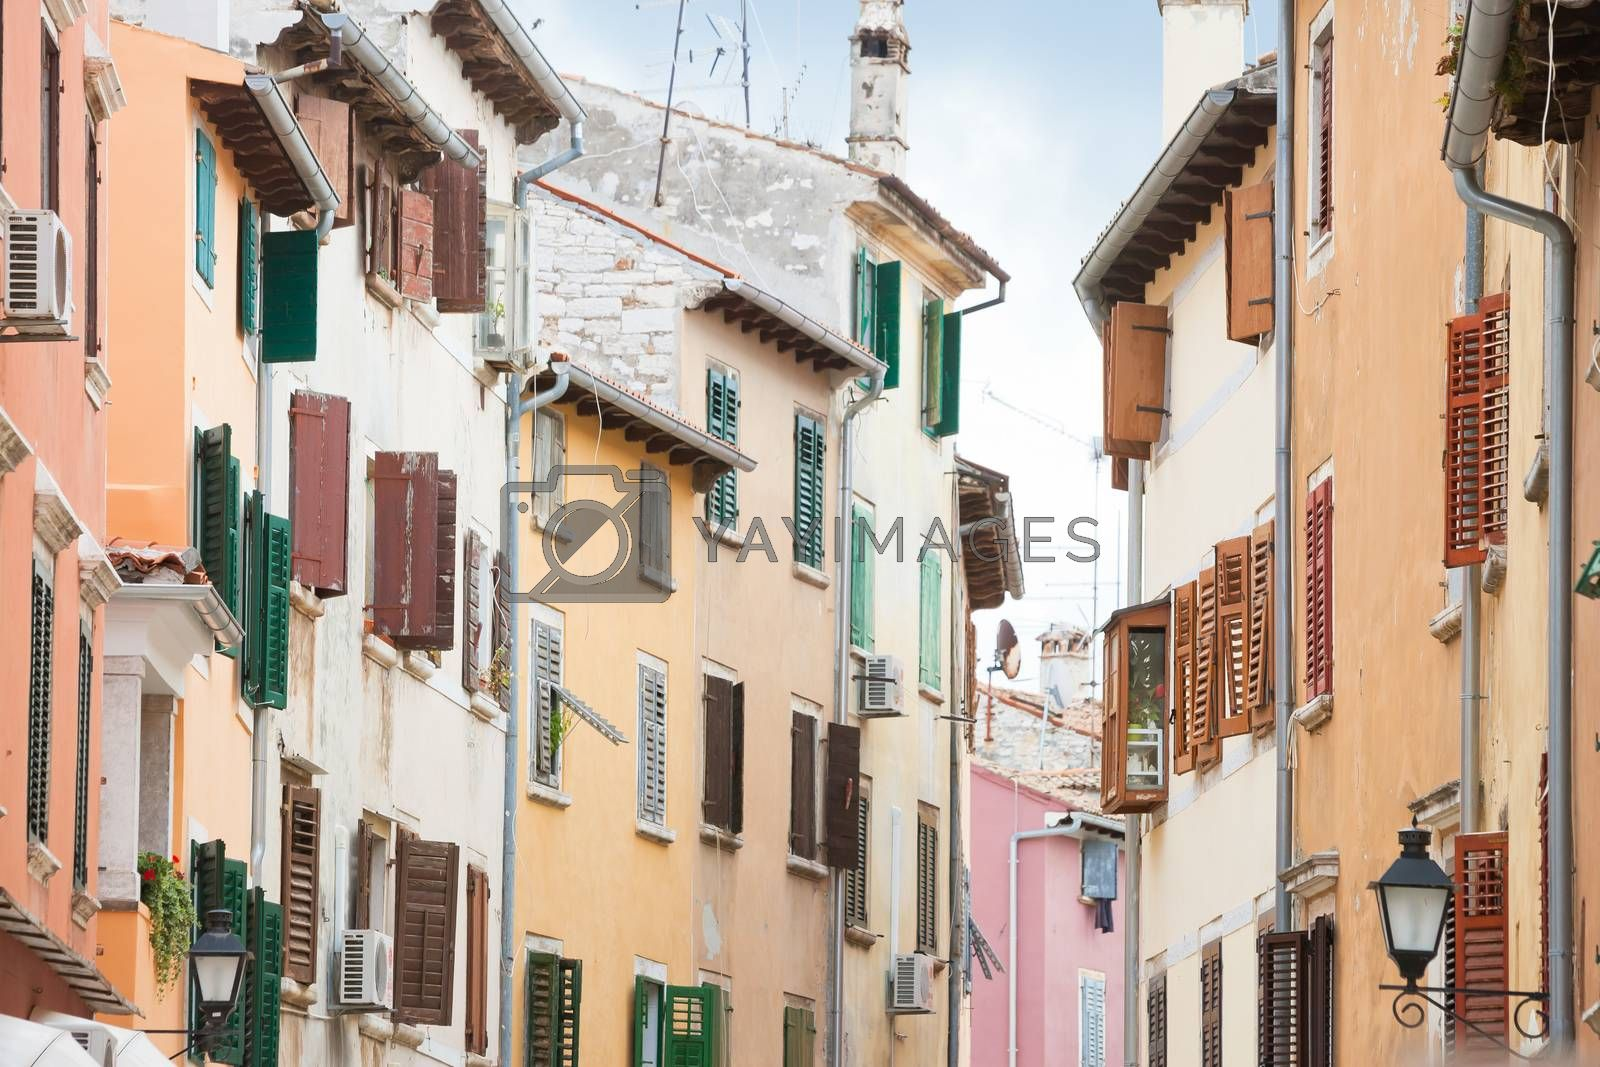 Rovinj, Istria, Croatia, Europe - Wooden lattice blinds at the houses of Rovinj